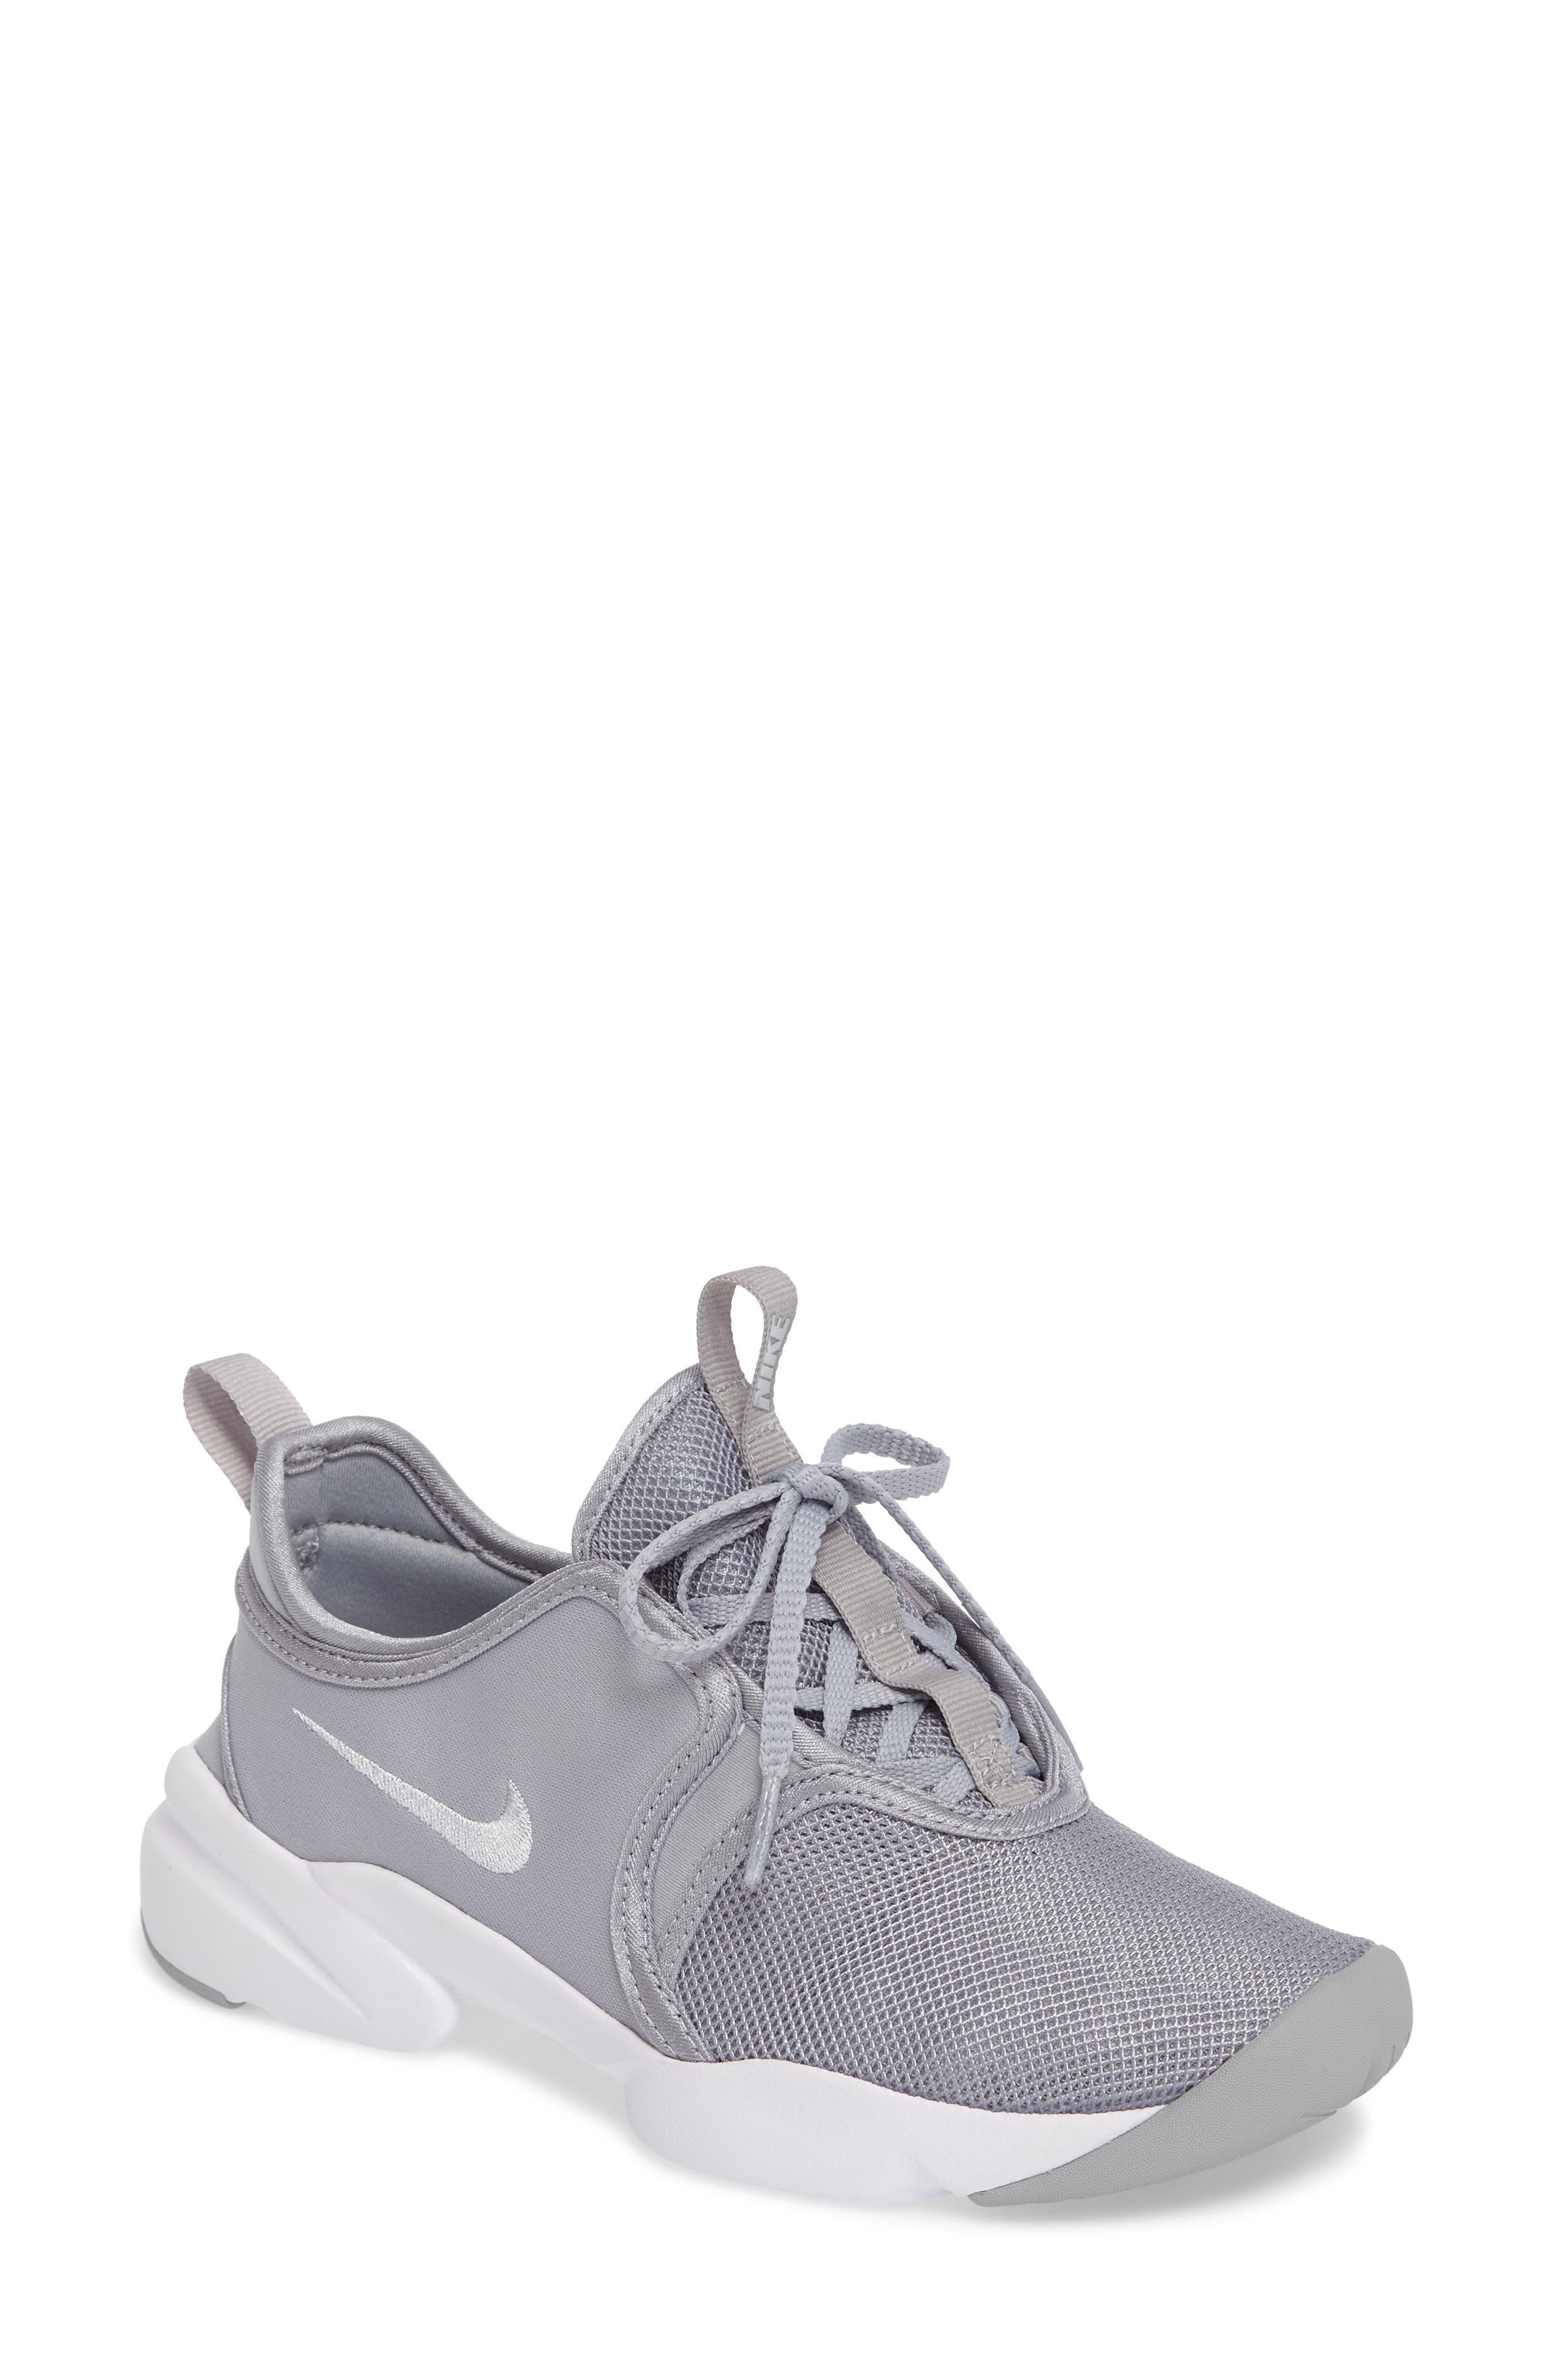 Main Image - Nike Loden Sneaker (Women)